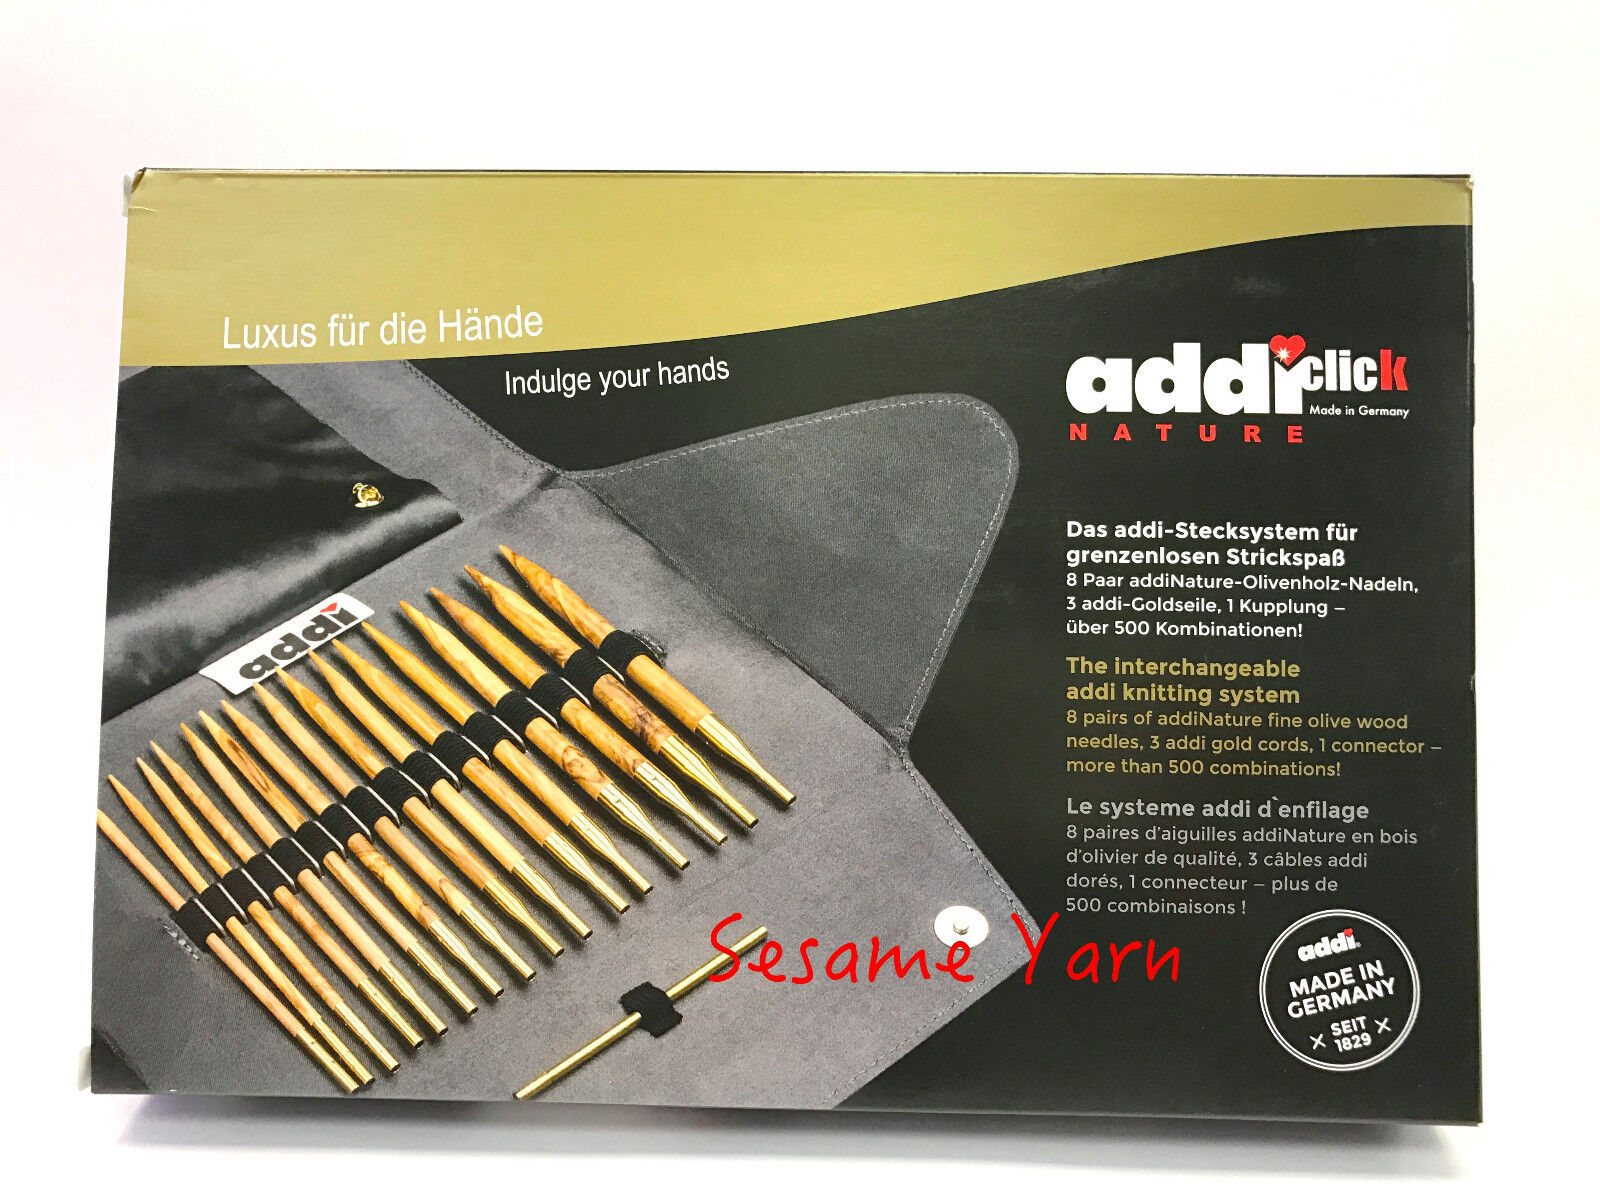 addi Click Nature Olive Wood GOLD Edition Interchangeable Knitting Needle set